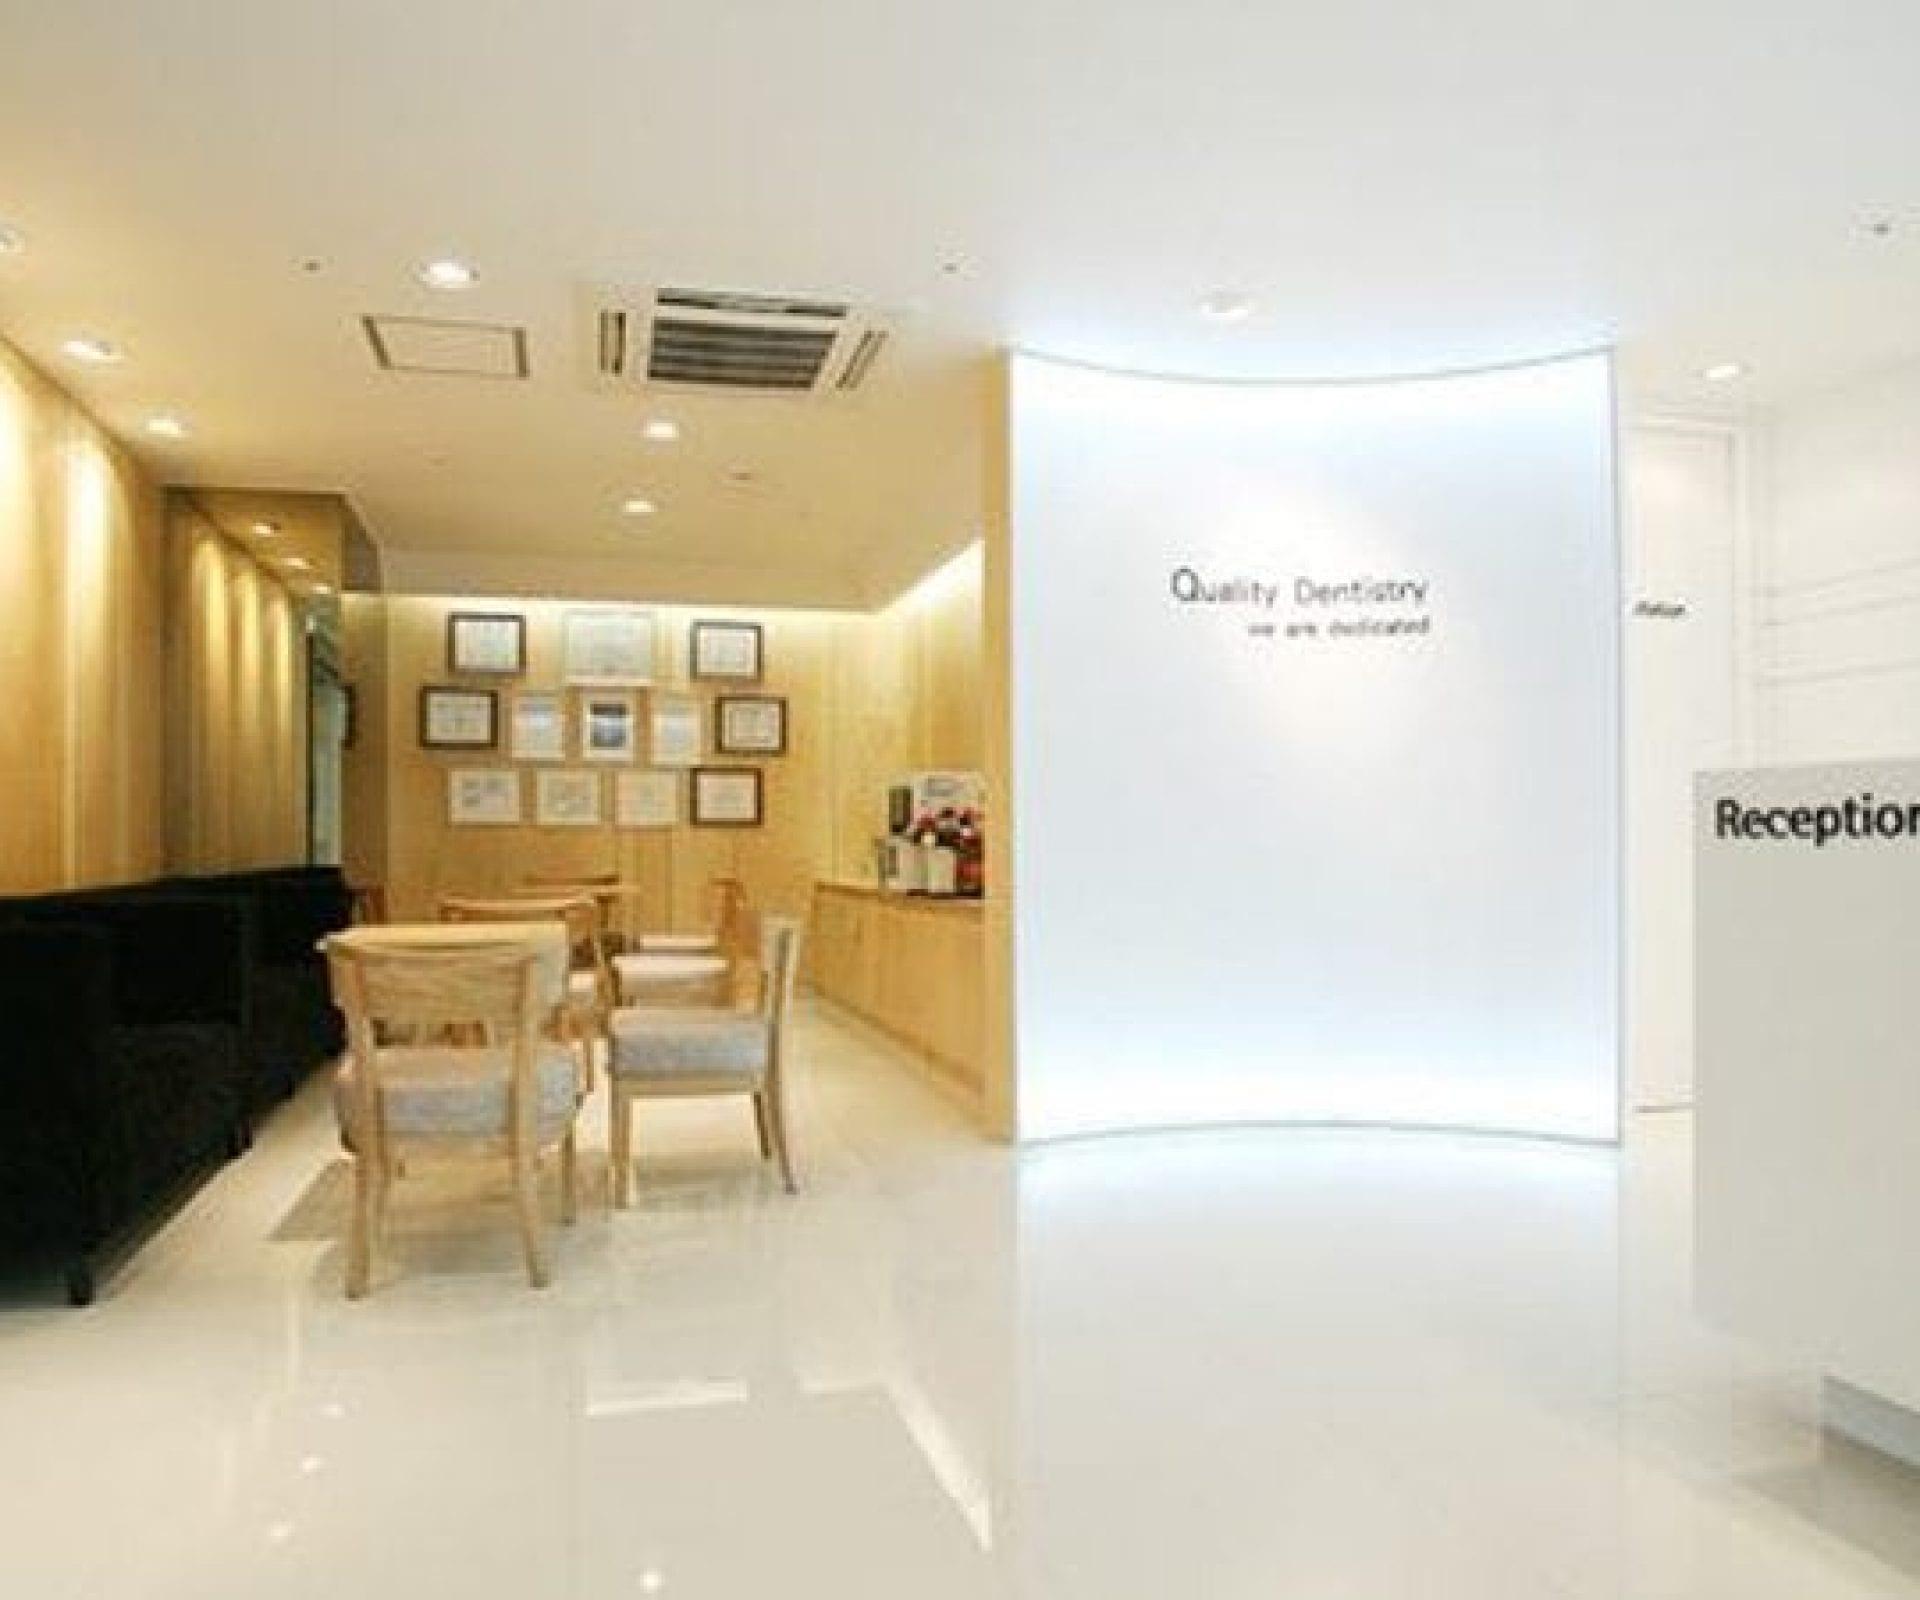 U.S. Dental | Yongsan-gu, Seoul